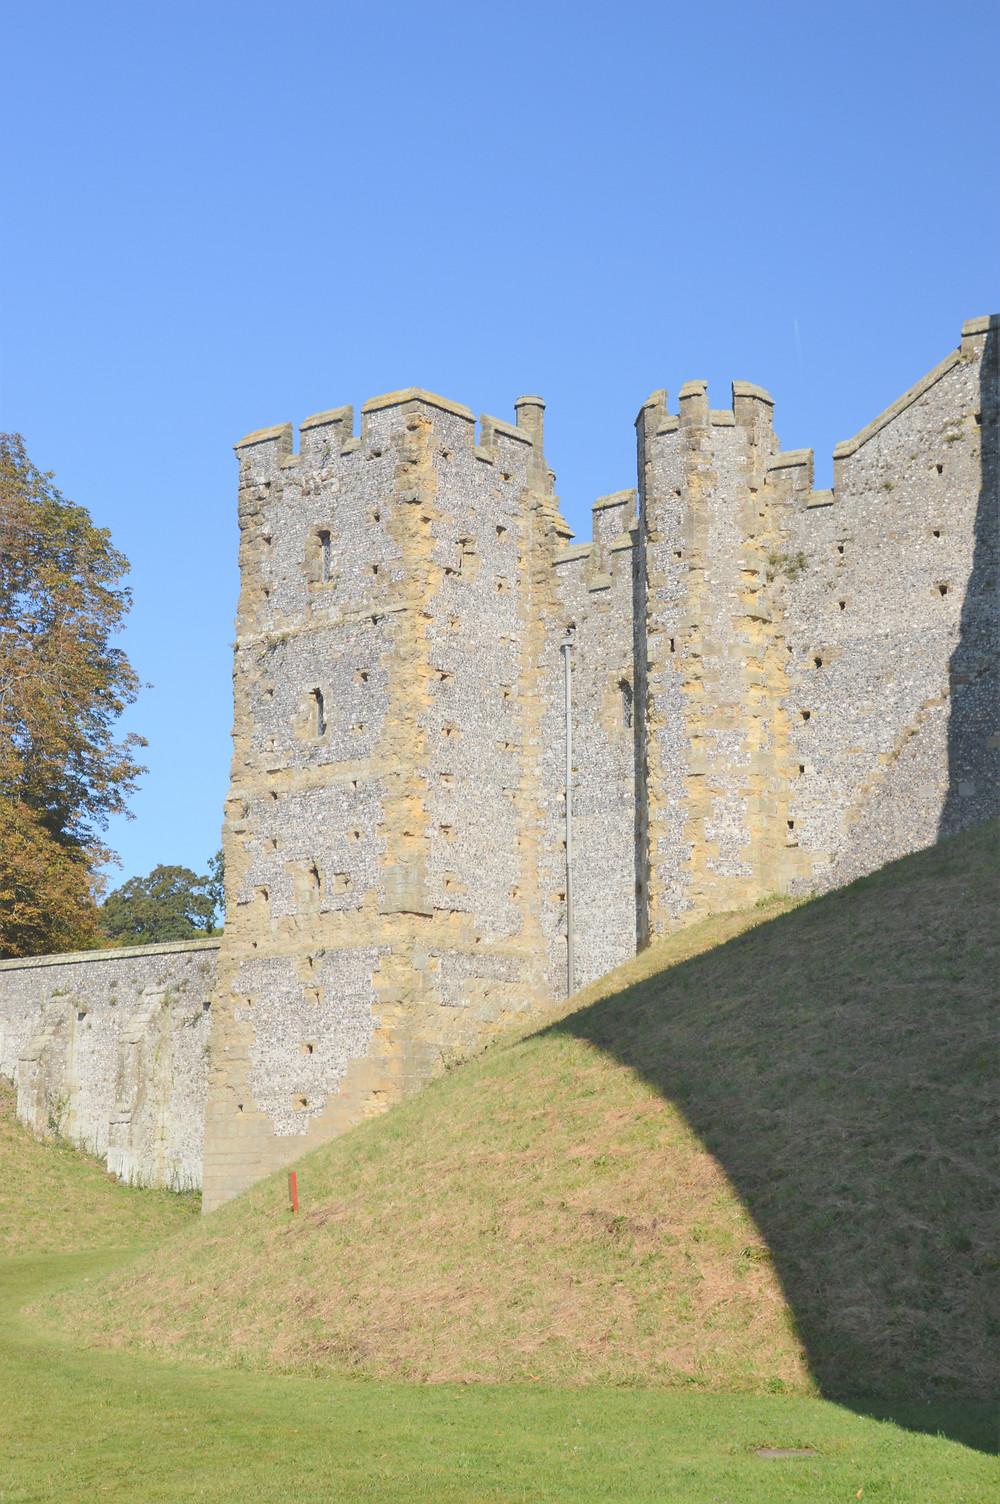 Imposing curtain walls surrounding Arundel Castle